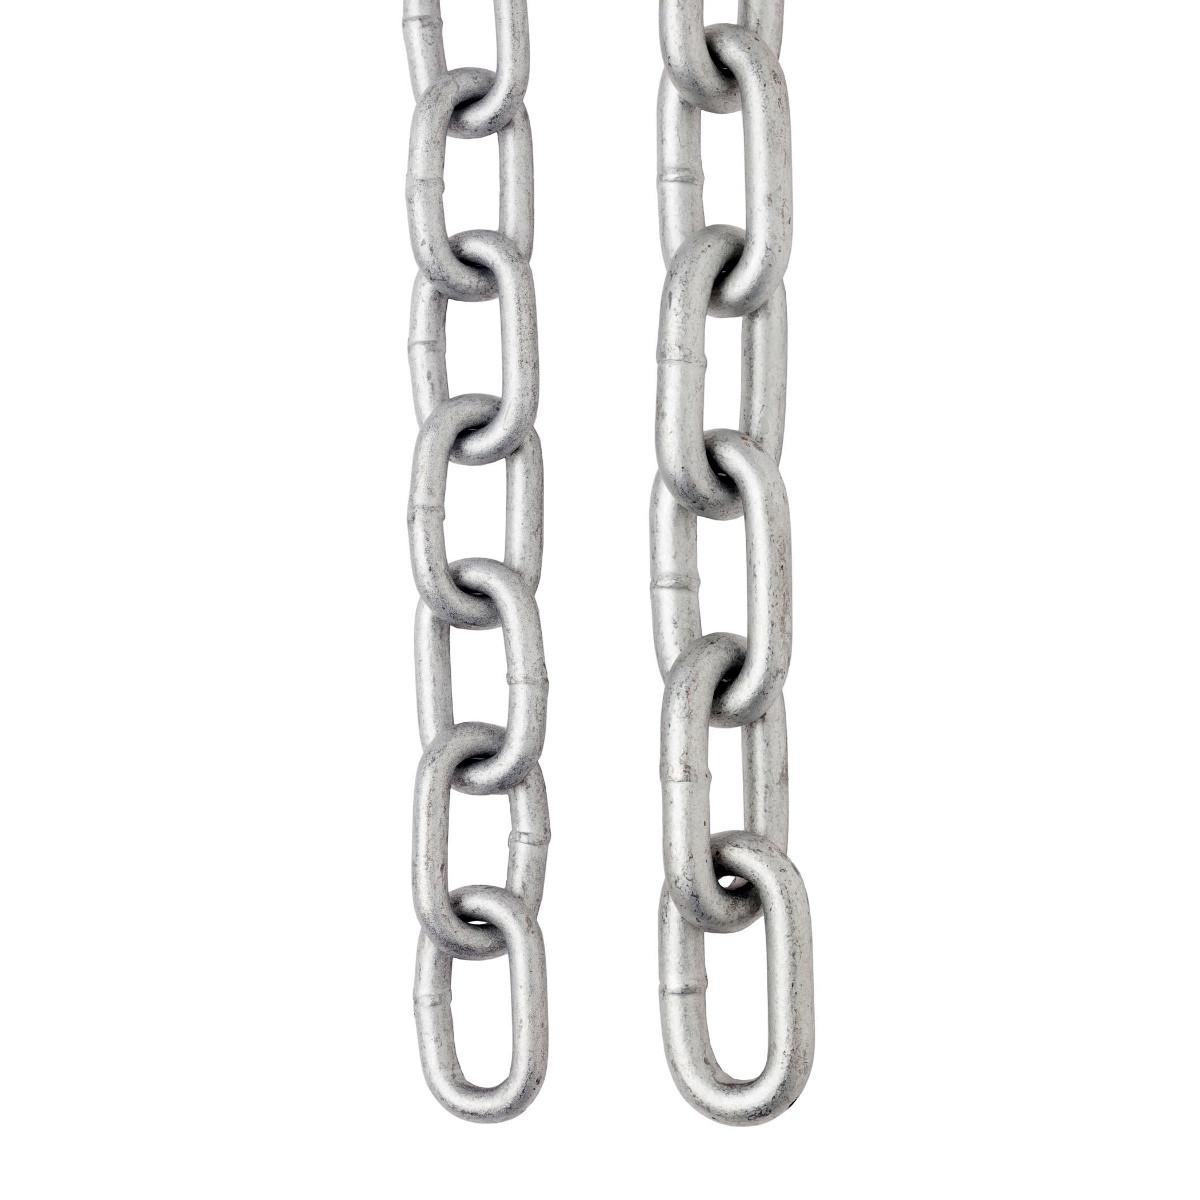 Smooth Galvanized Swing Chain